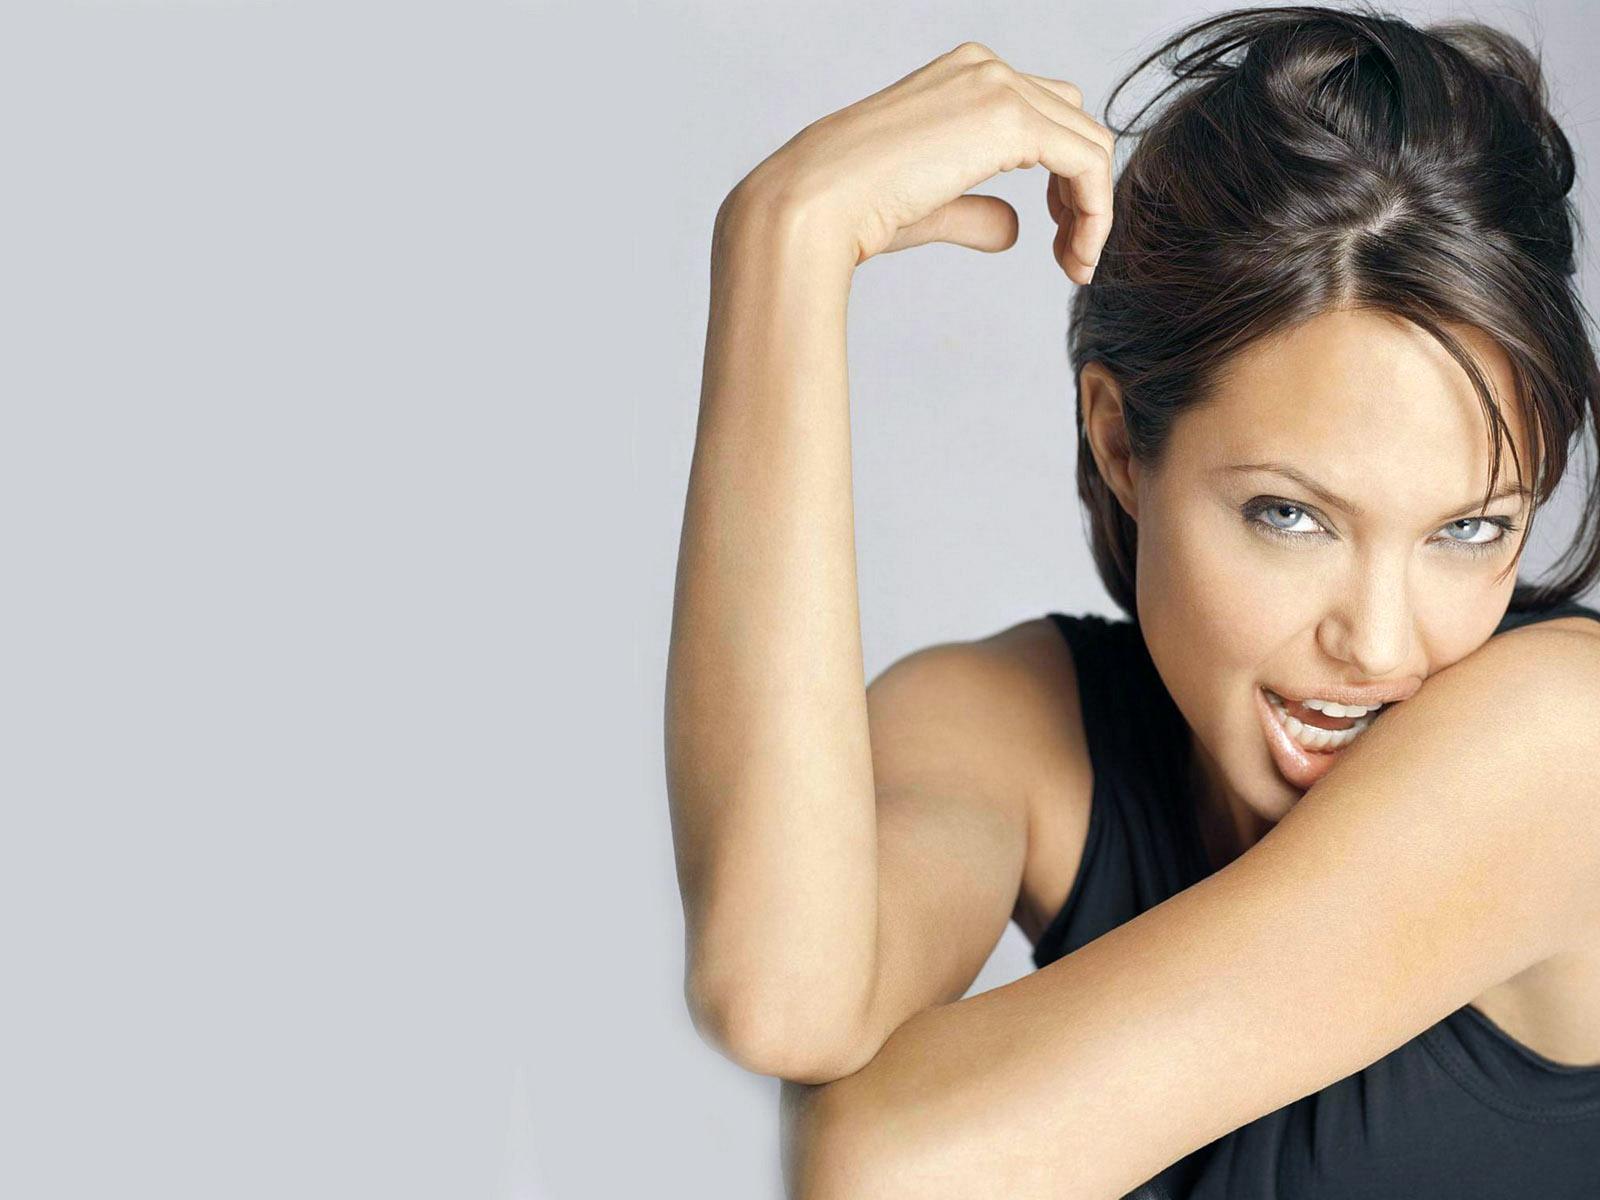 Nude Angelina Jolie Screensaver 88